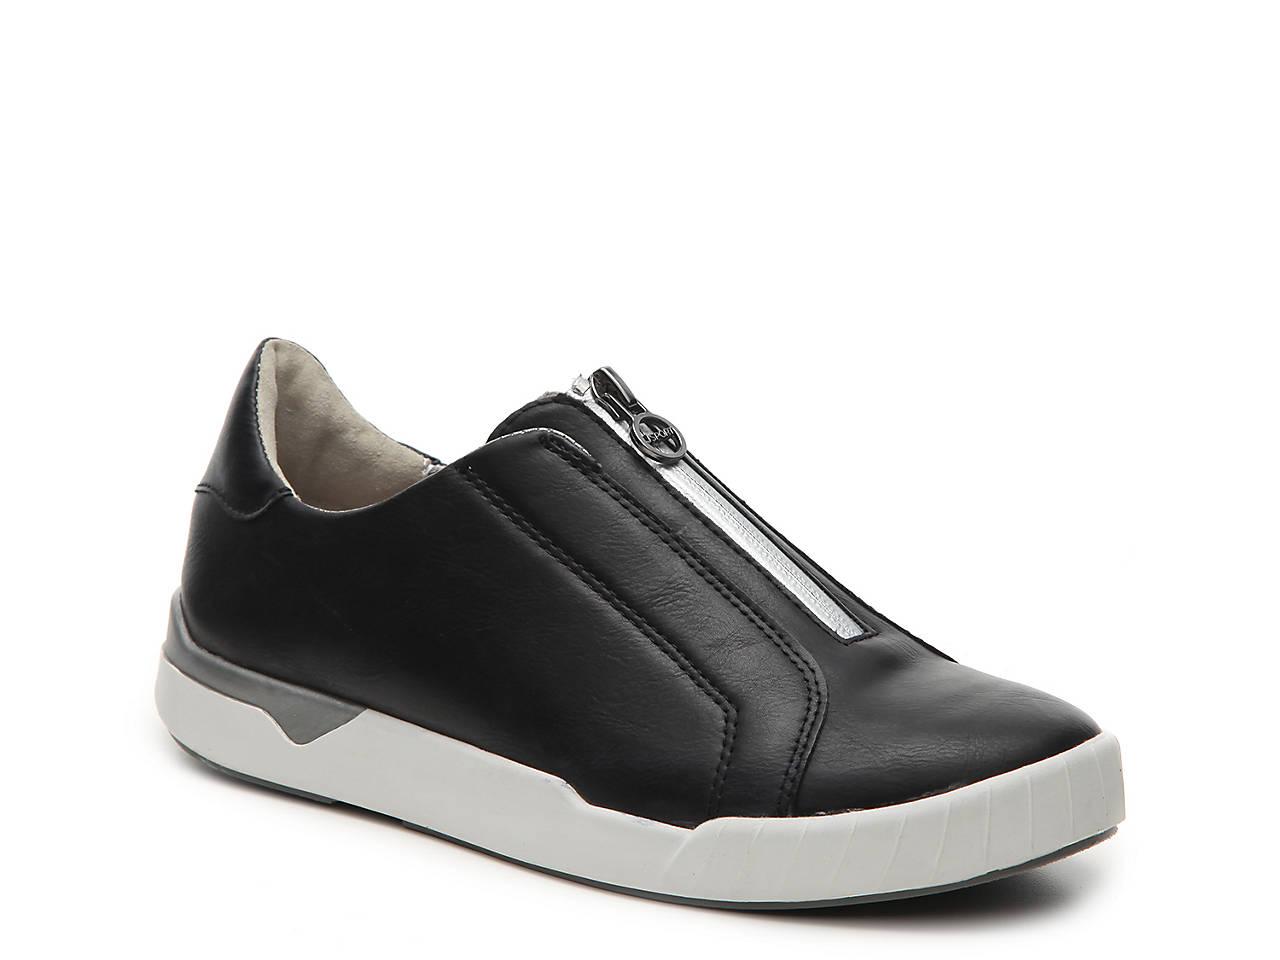 da73a4bea352 J Sport by Jambu Cottage Sneaker Women s Shoes